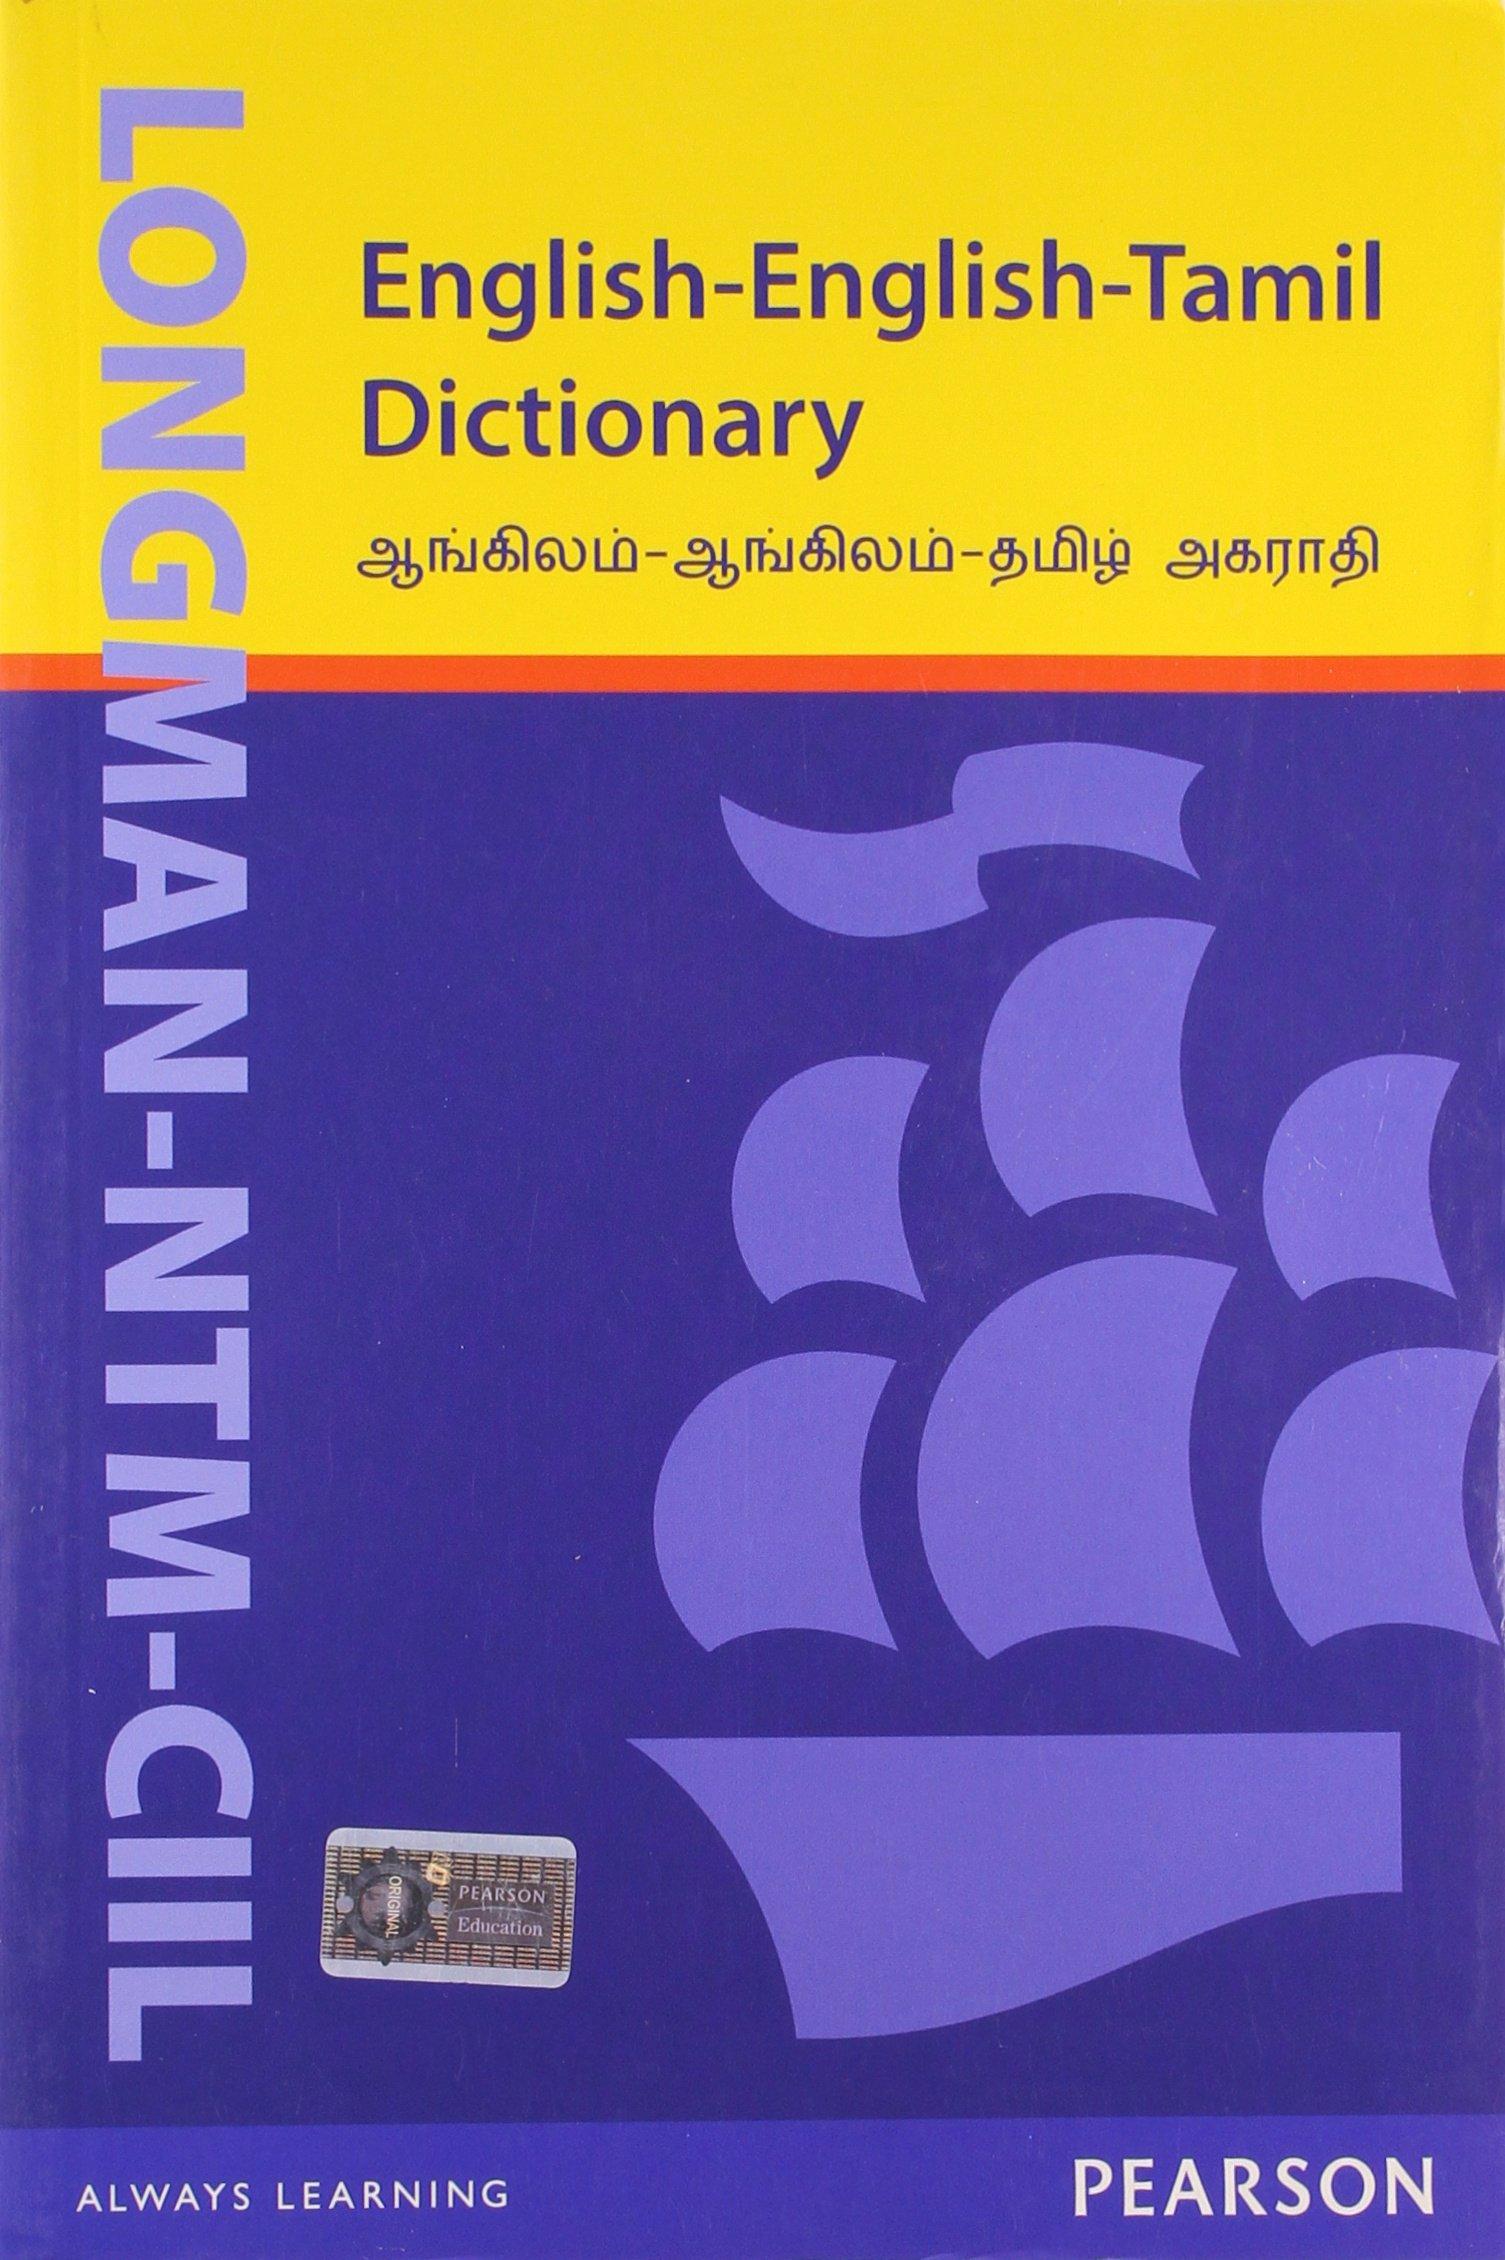 Telugu To Tamil Translation Book